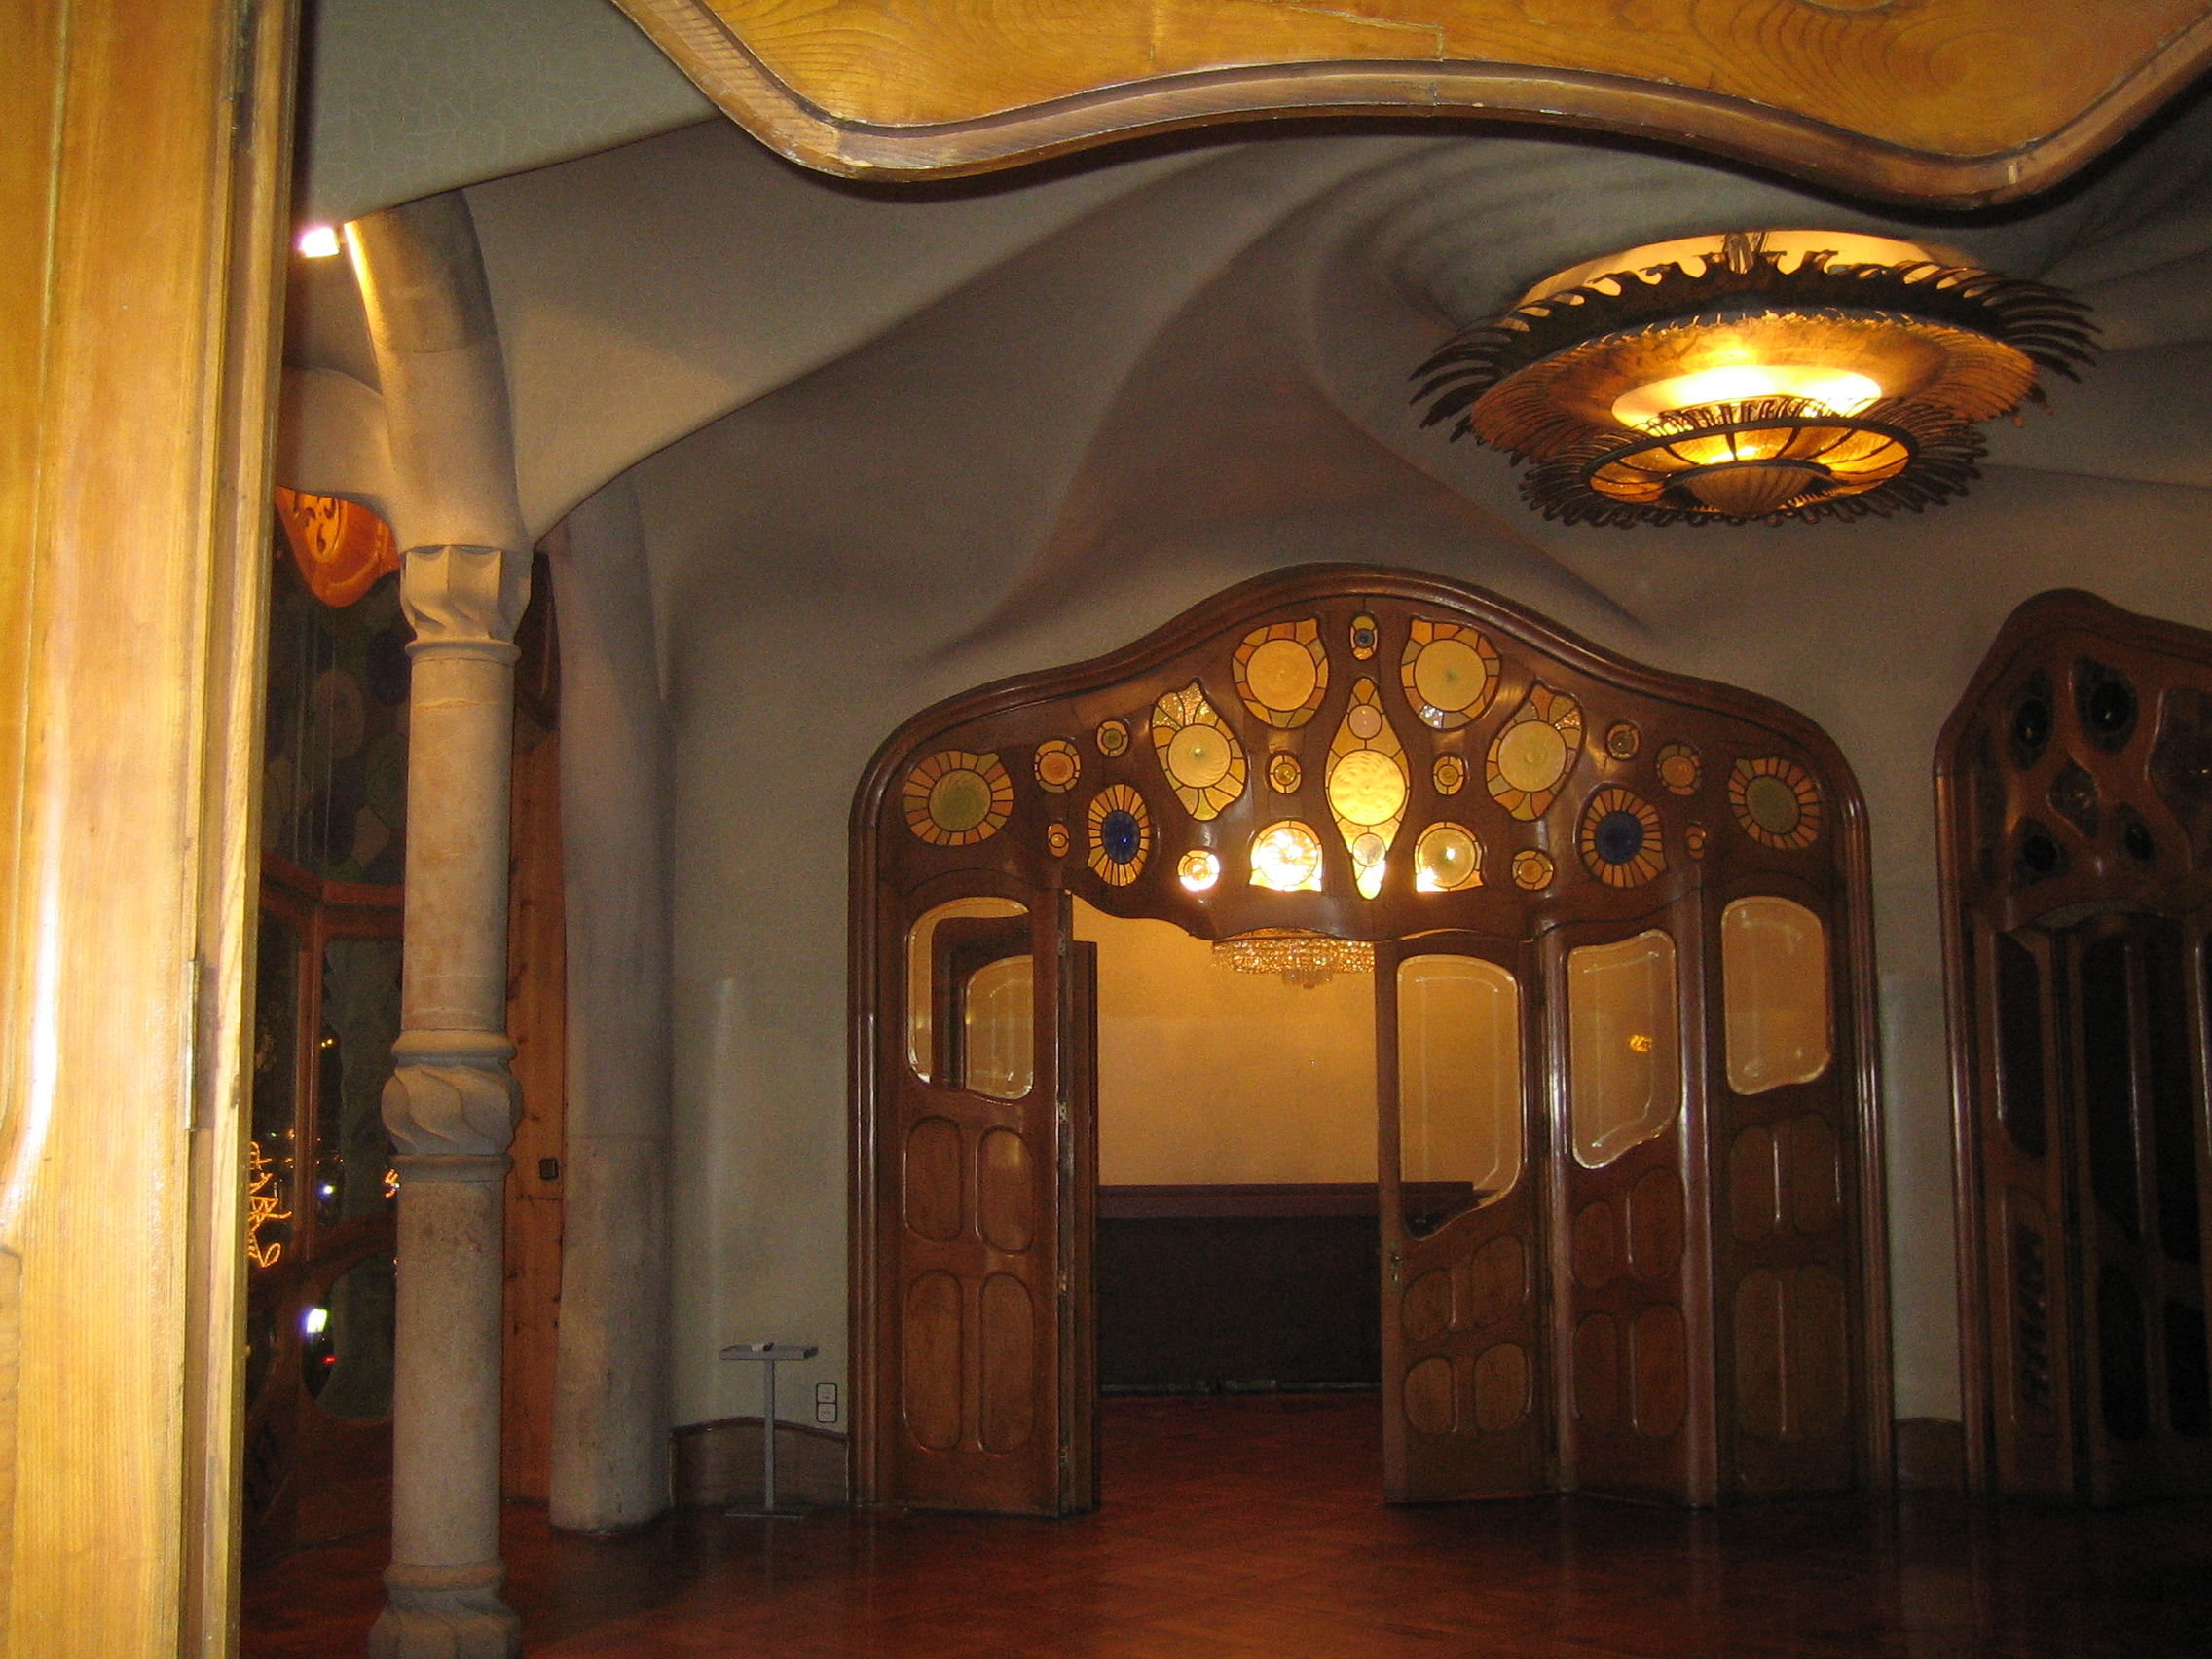 File:Gaudi Casa Batllo.jpg - Wikipedia